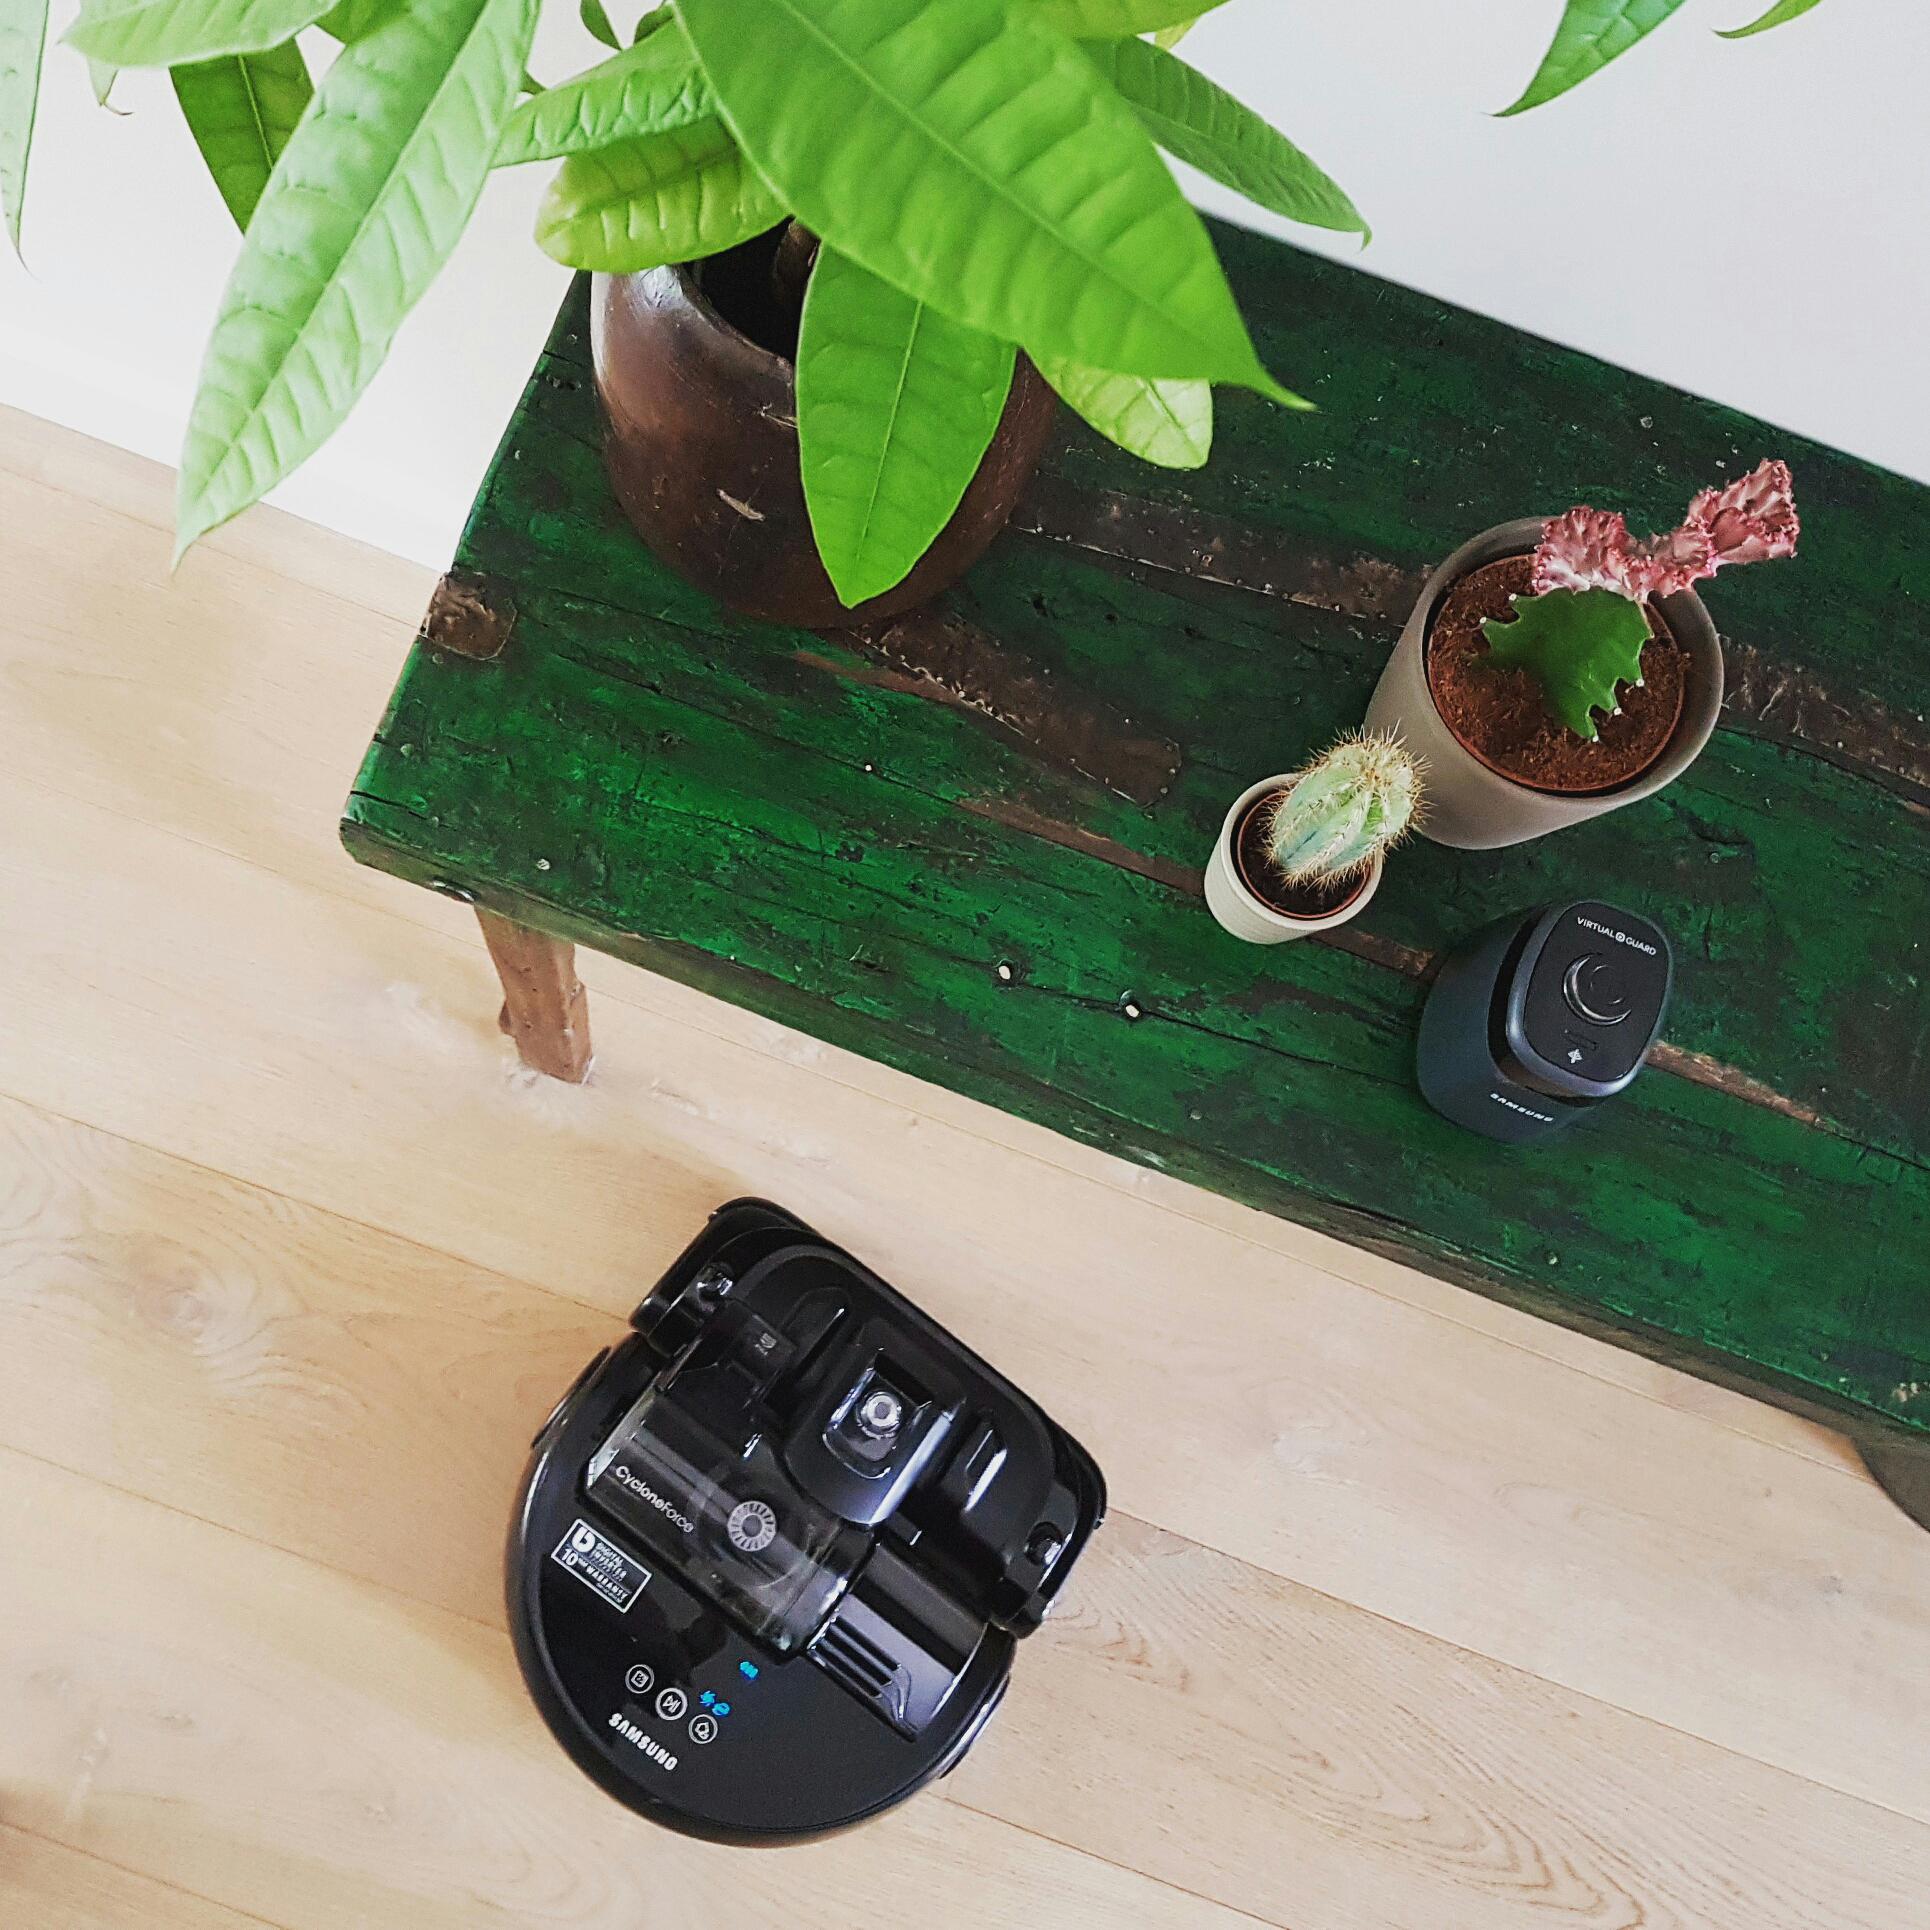 Samsung smart home powerbot